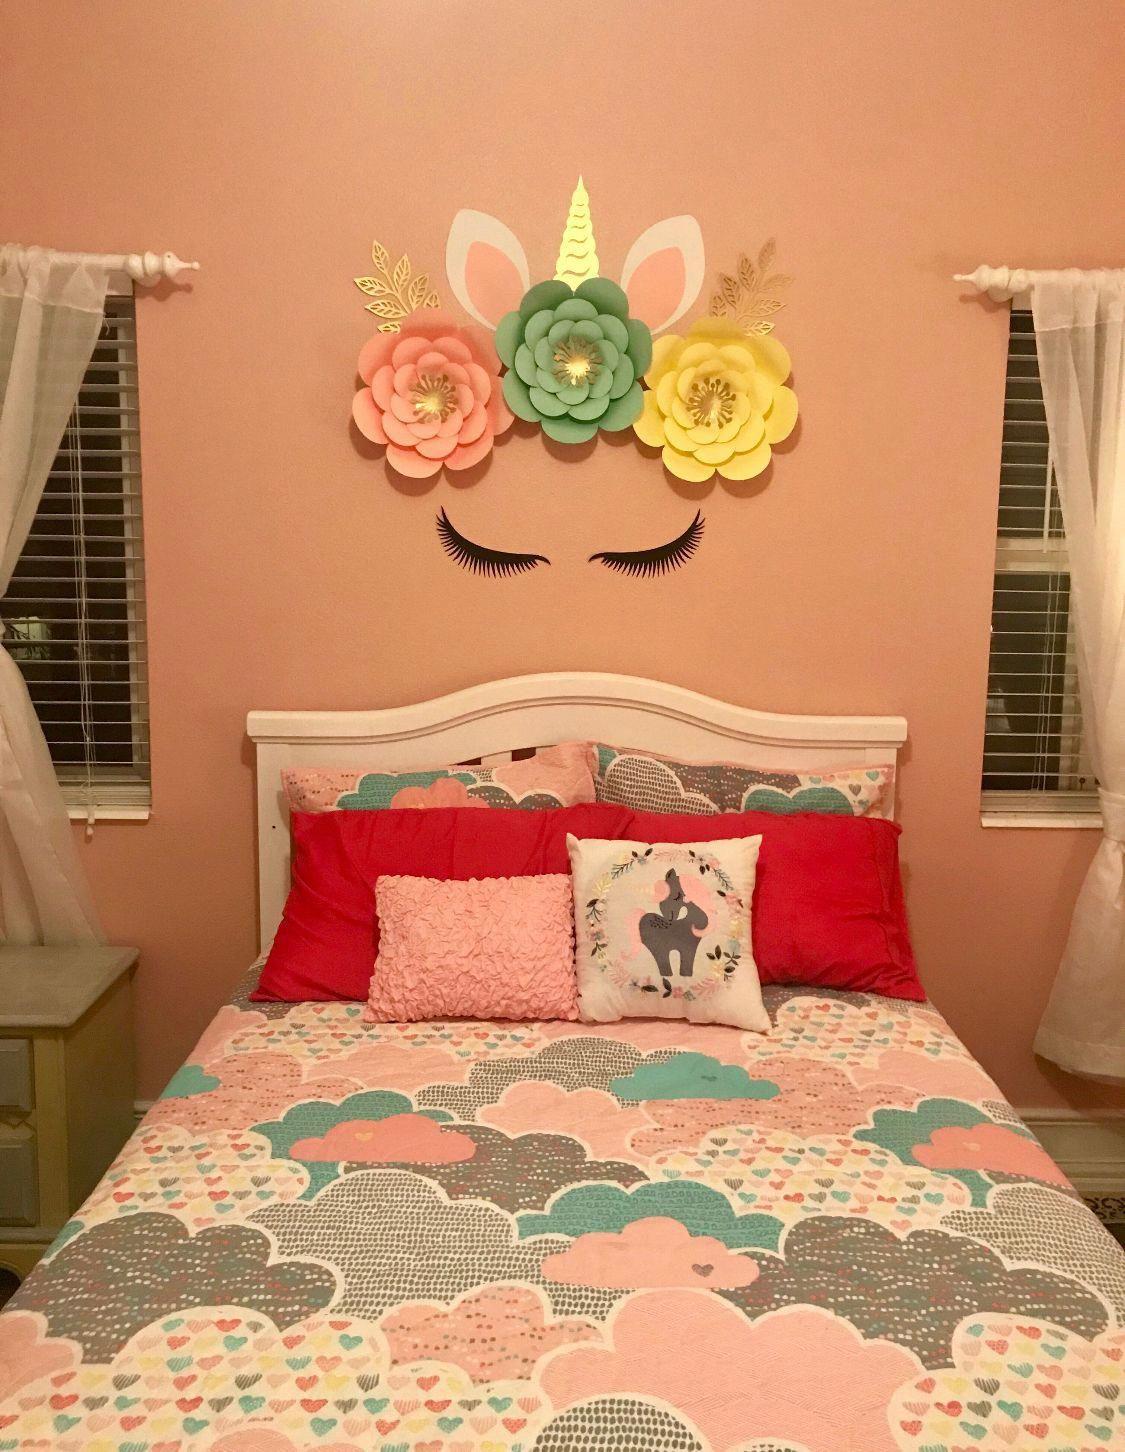 kids rooms decor direct kidsroomsdecor  unicorn room